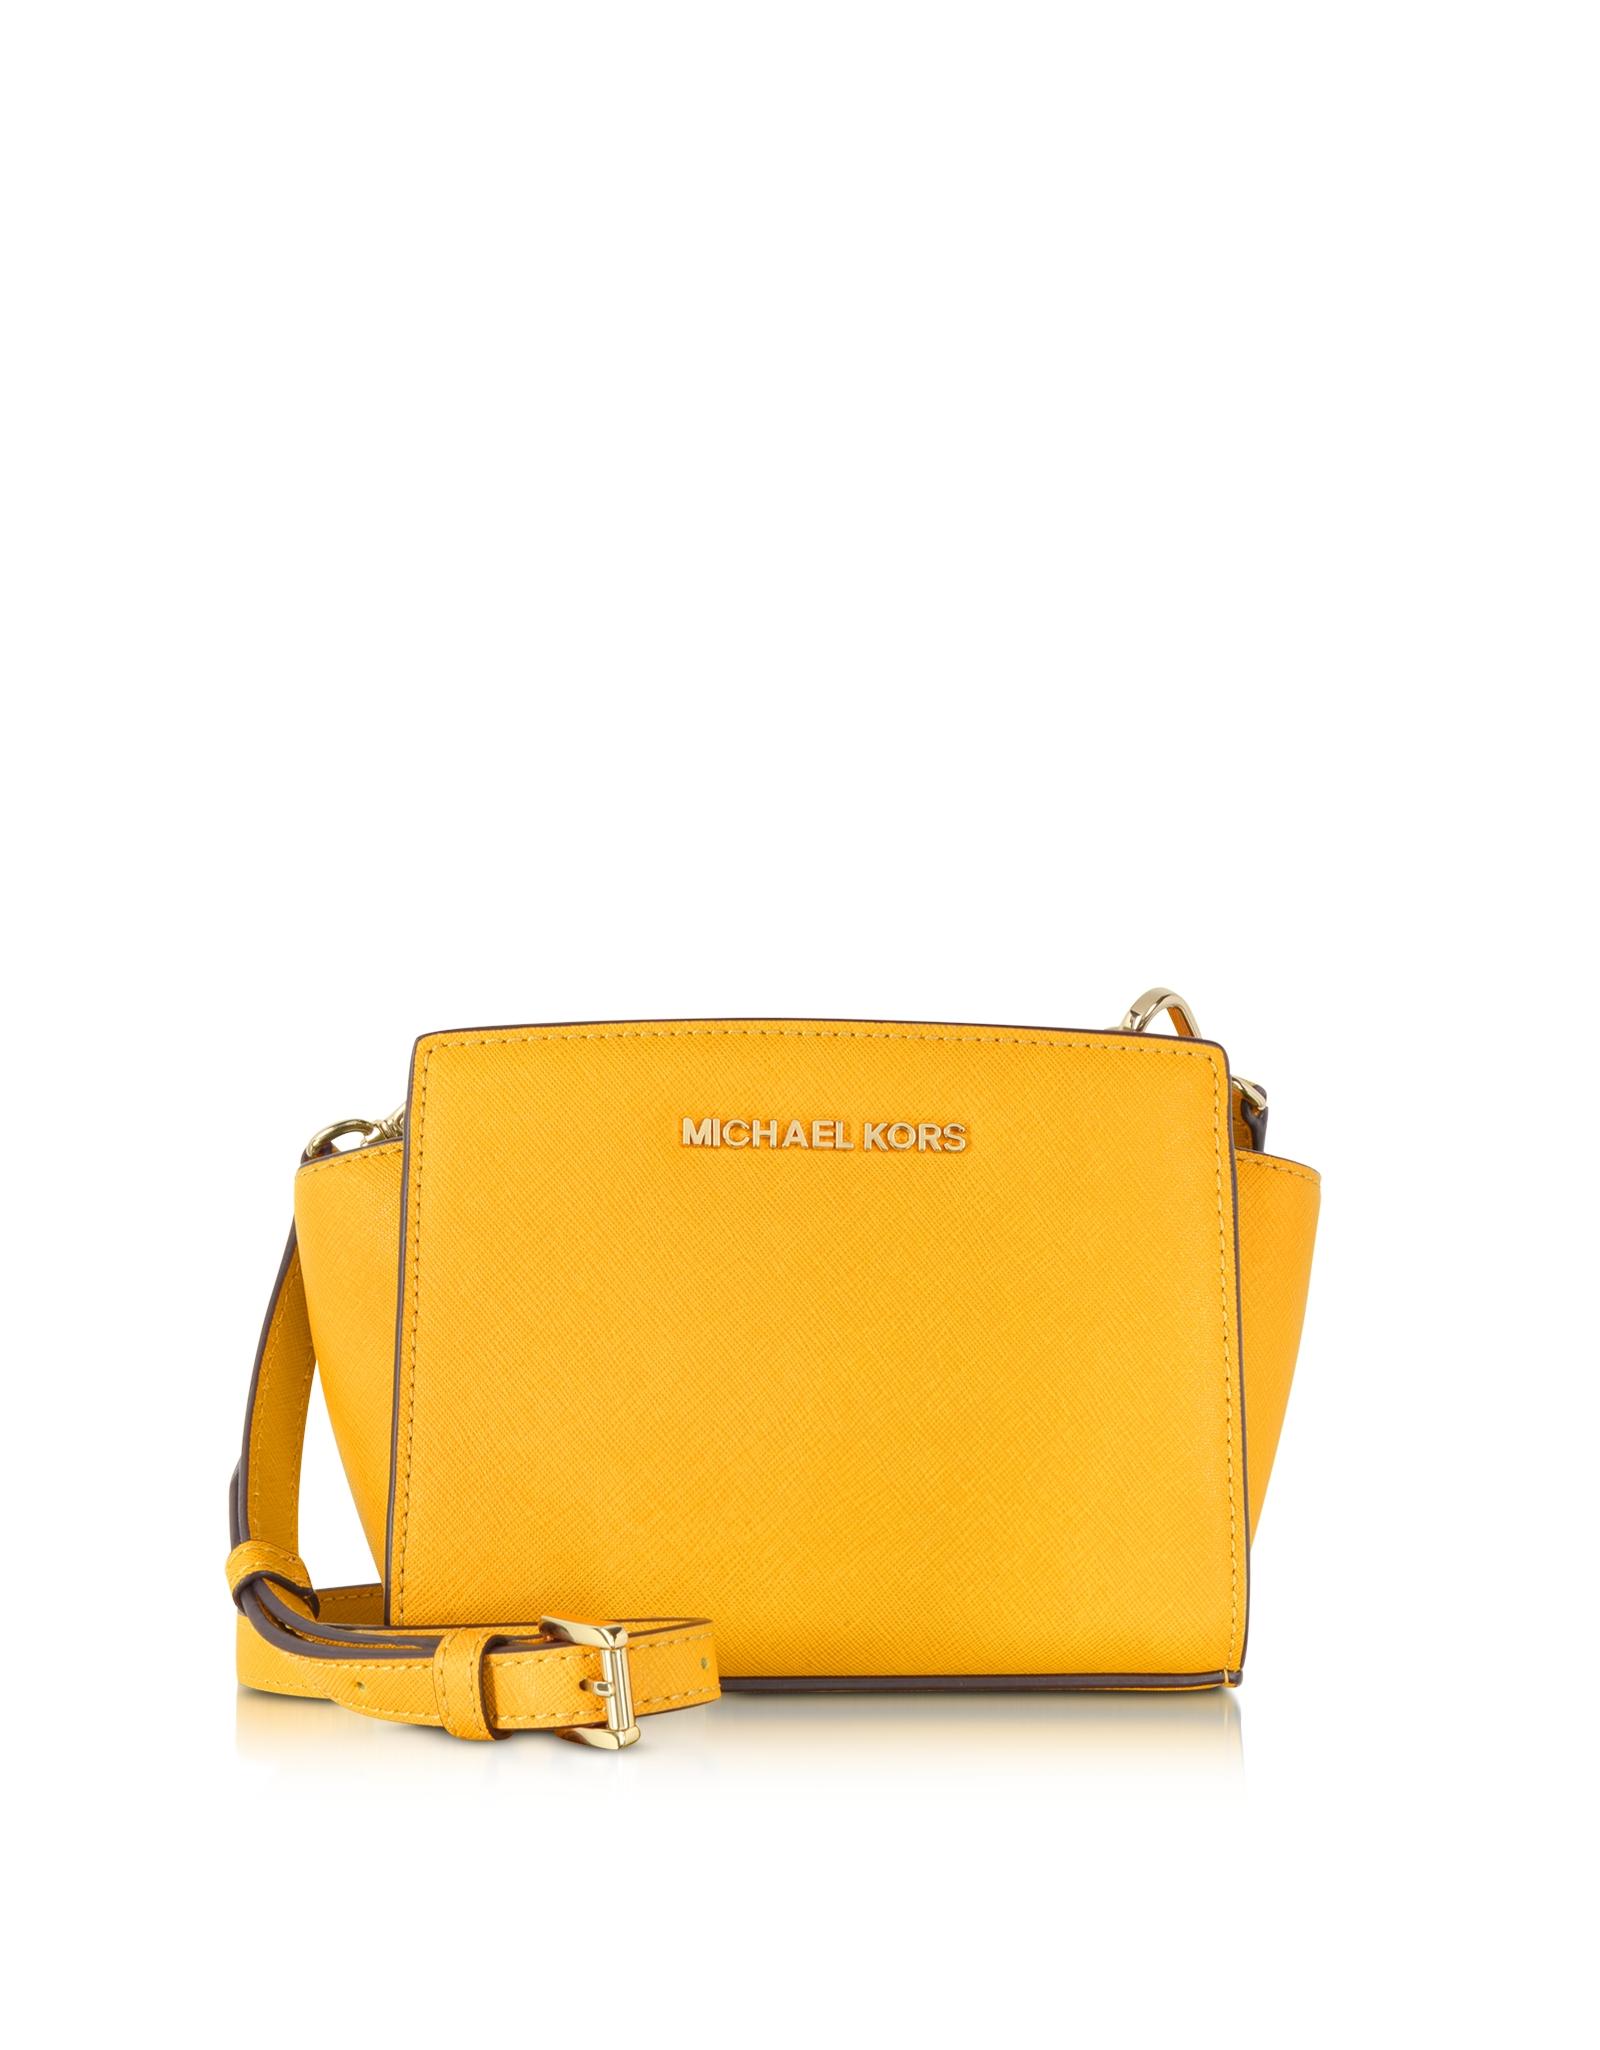 7a9b549f1196 Lyst - Michael Kors Selma Saffiano Leather Mini Messenger in Yellow